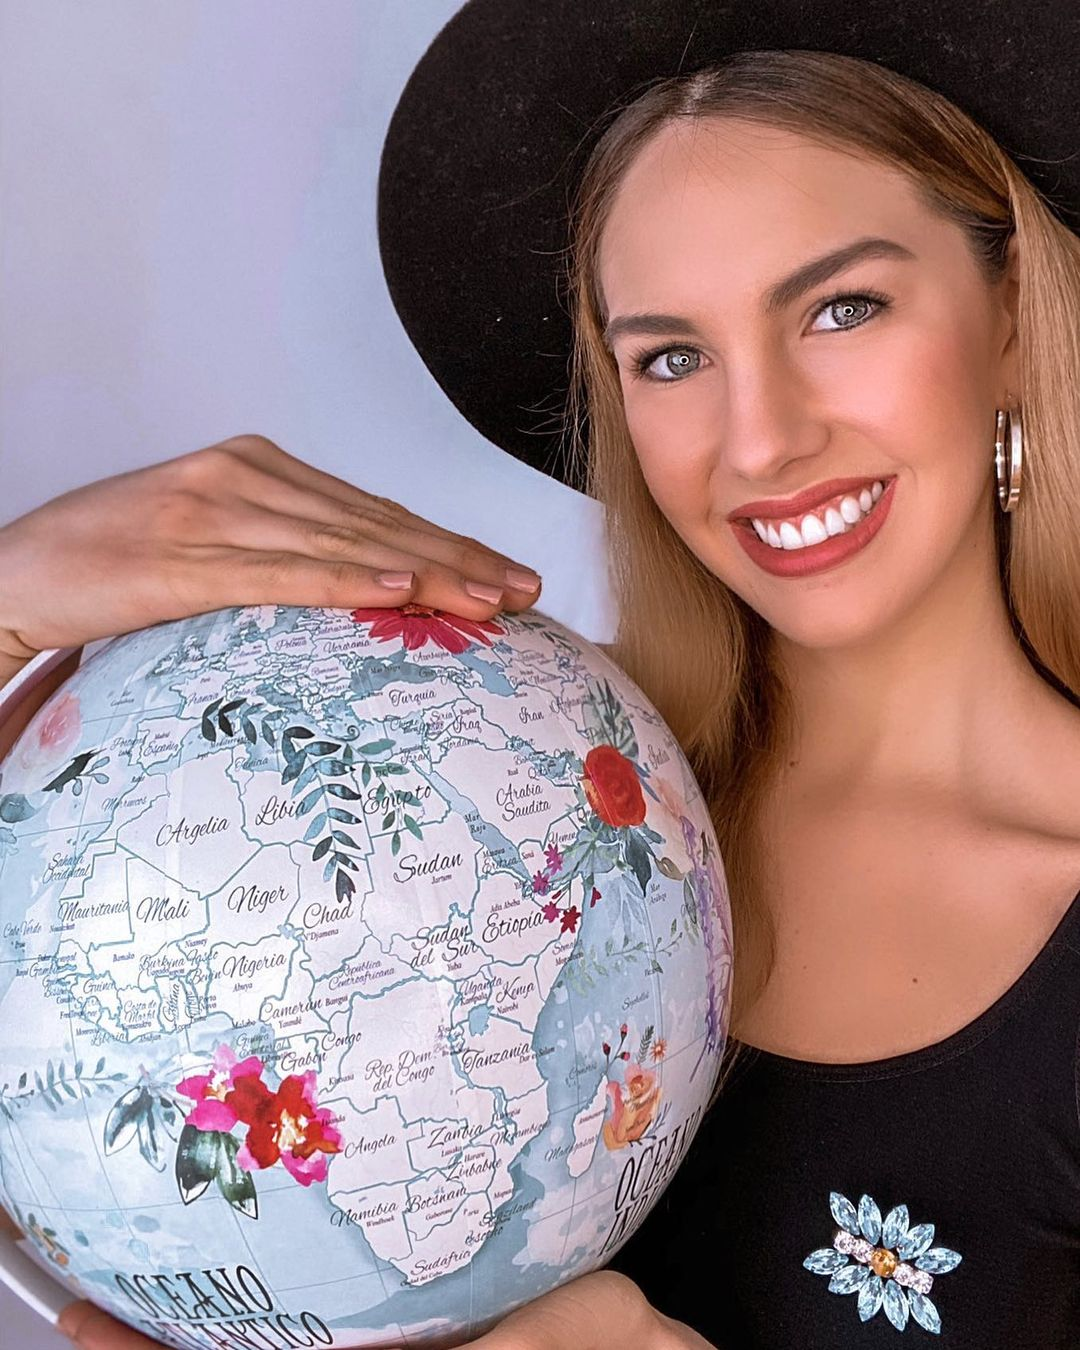 alina akselrad, top 21 de miss universe 2020. - Página 3 11878210